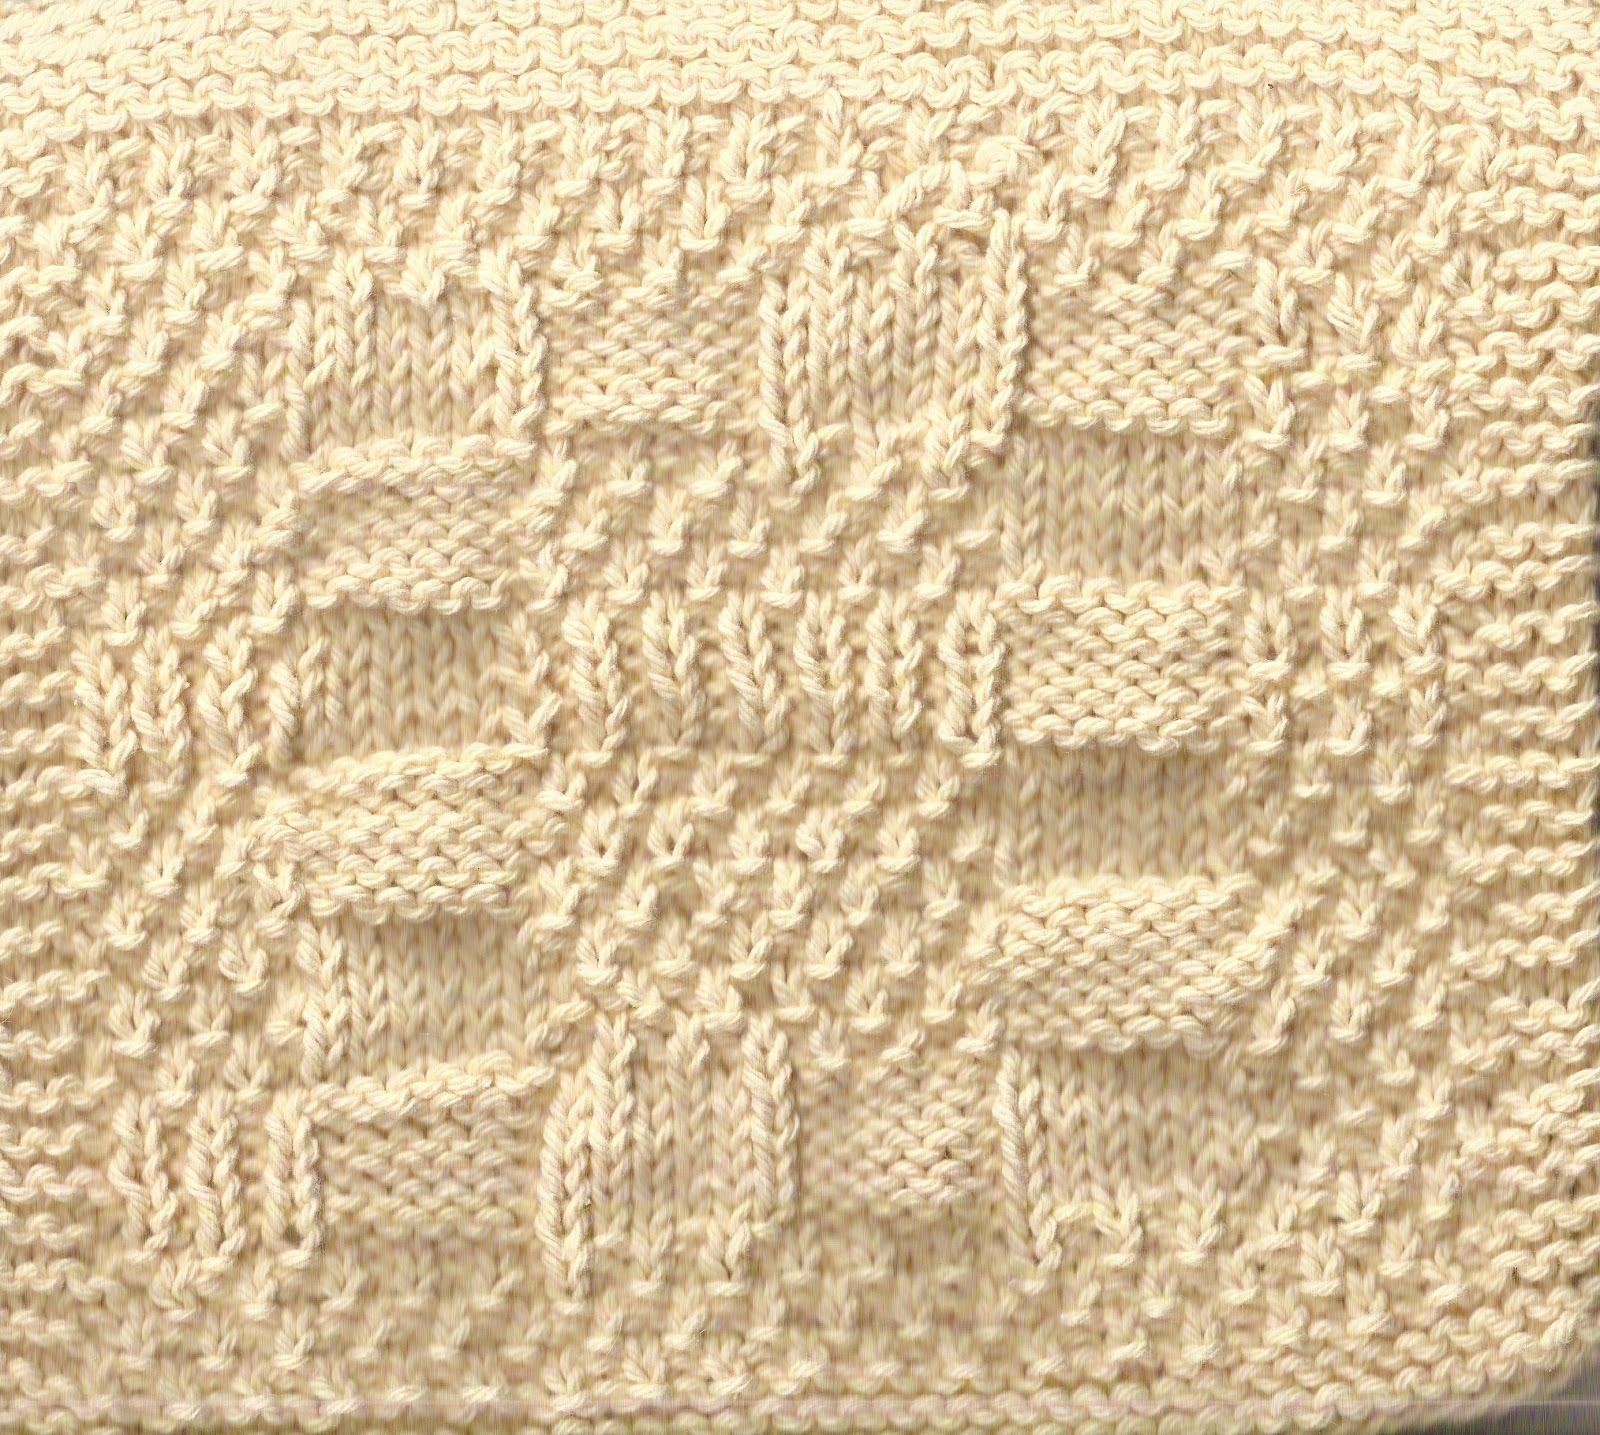 Luvsknitting: A Really Reversible Dishcloth